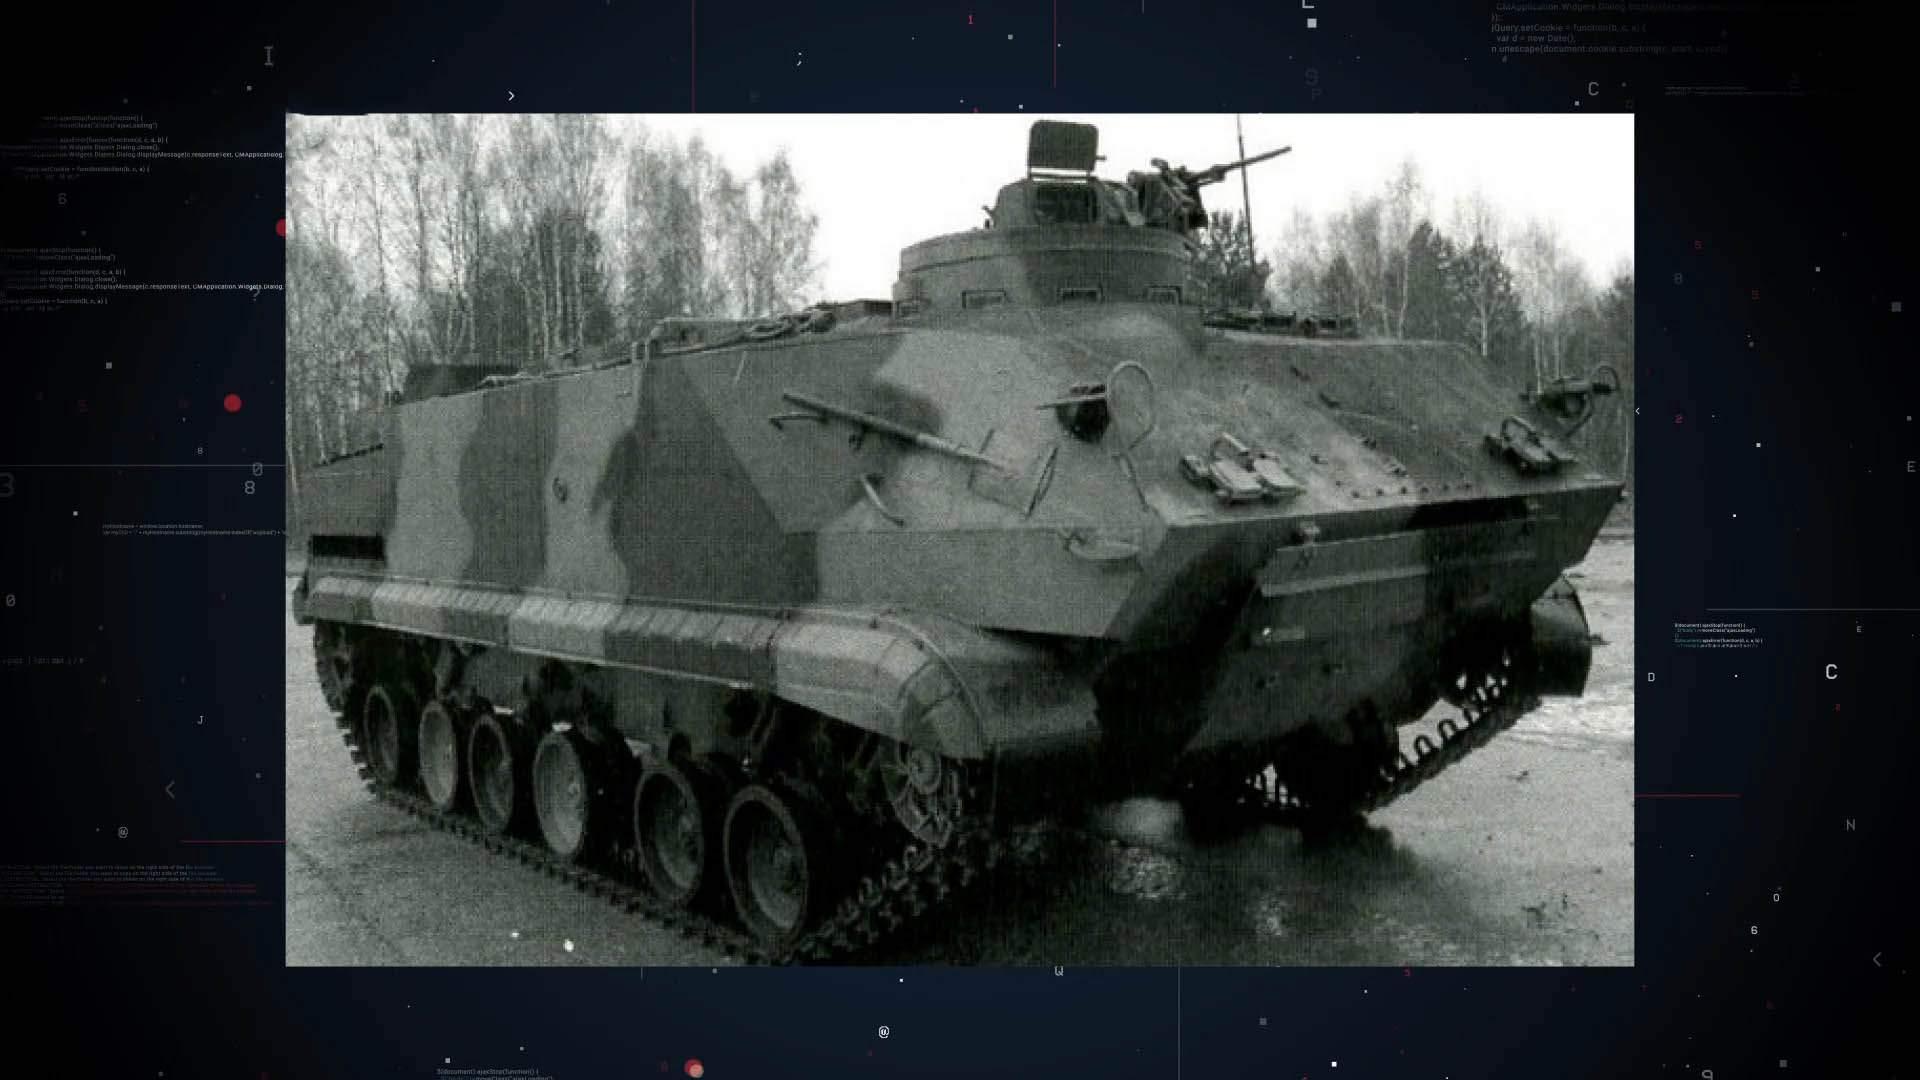 росія війна на донбасі зброя